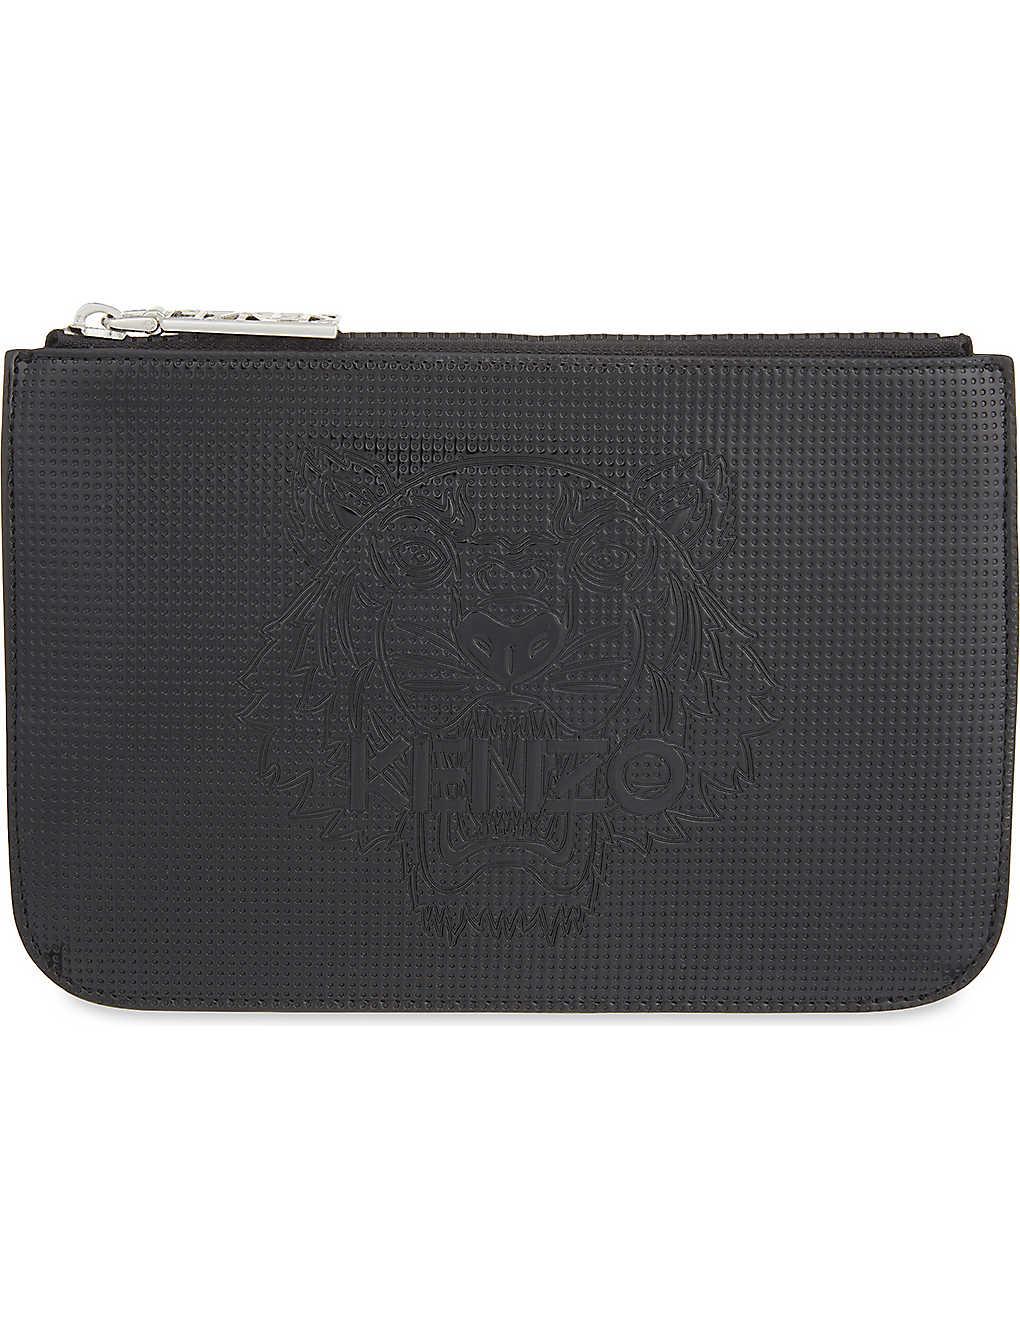 95e7db3228 KENZO - Tiger leather pouch   Selfridges.com